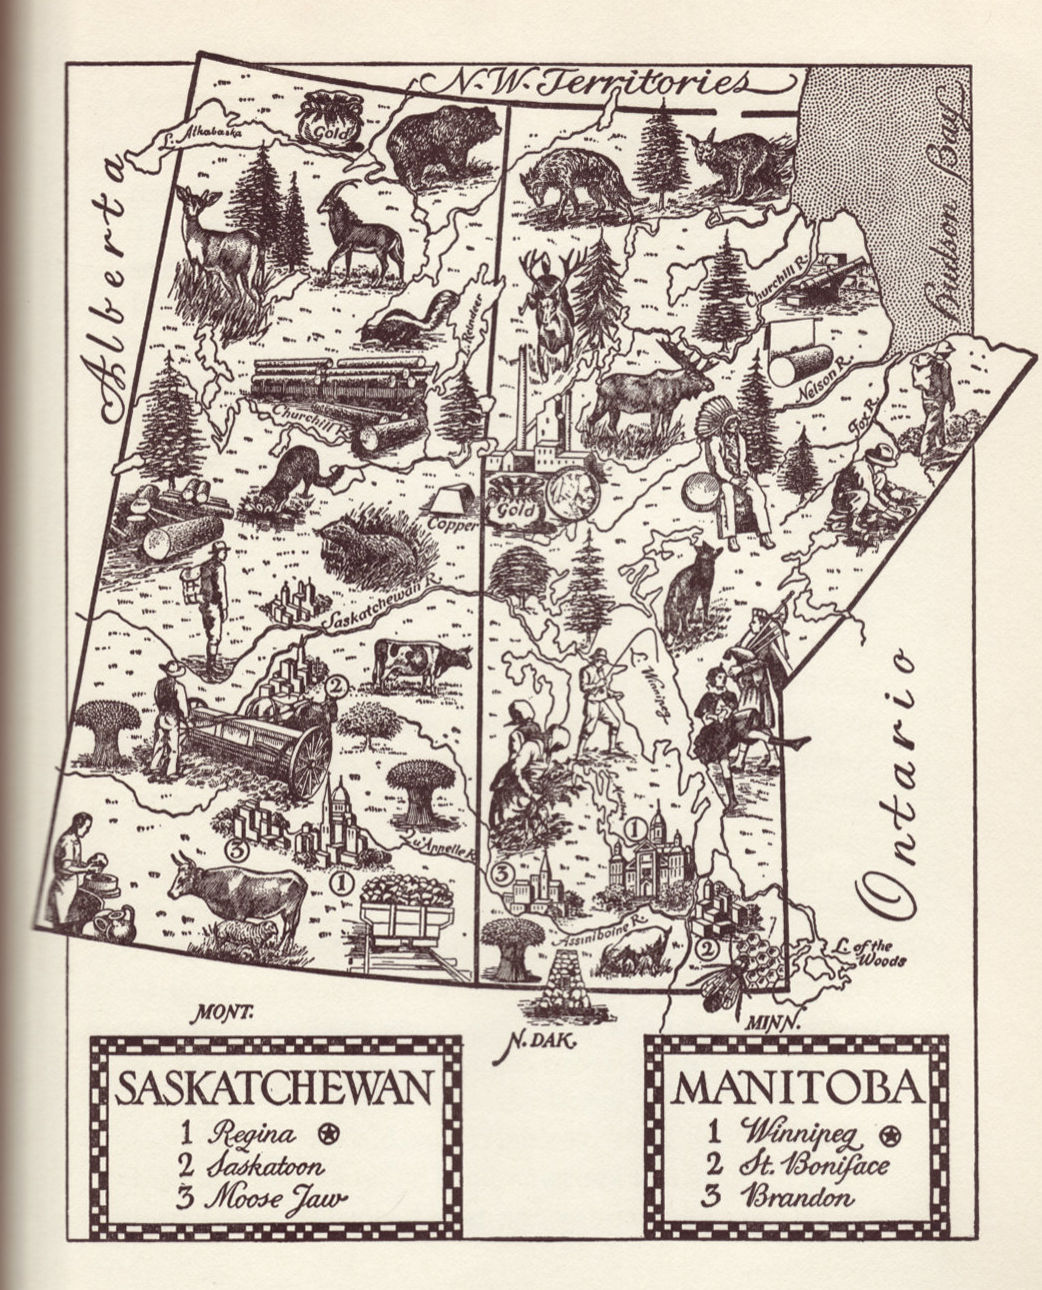 manitoba-saskatchewan